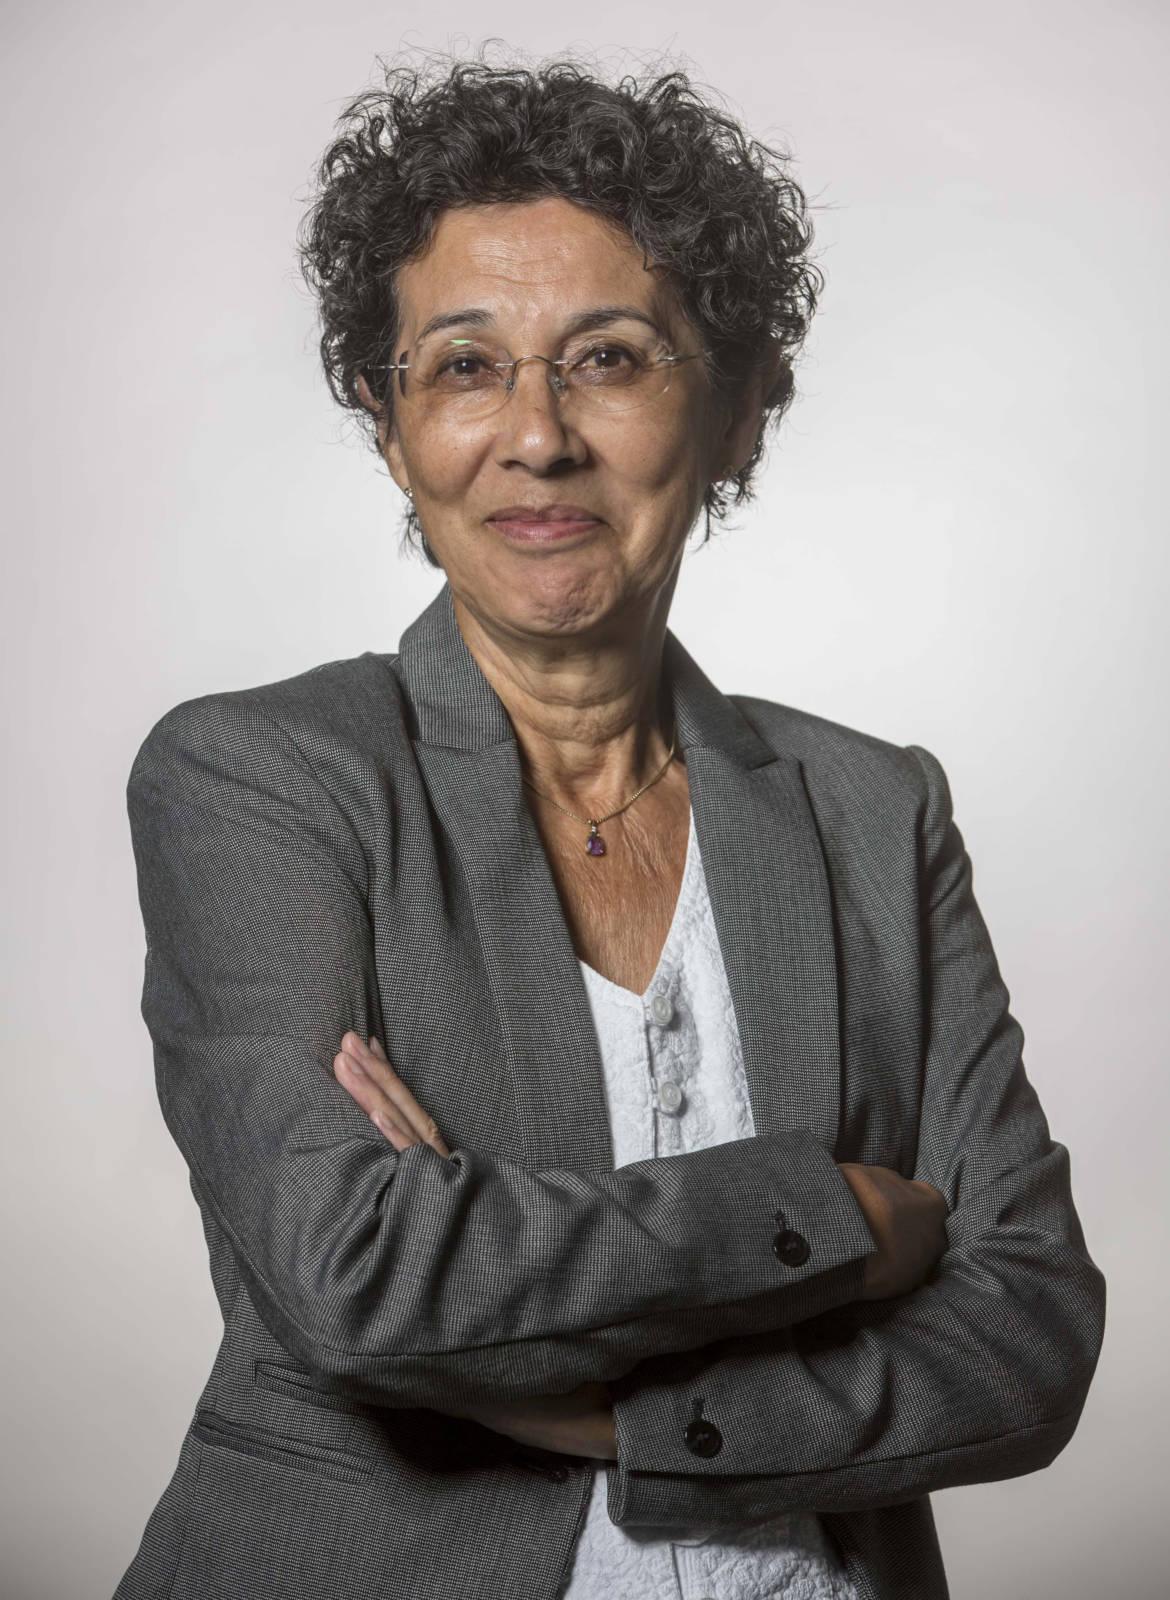 Catrien Mesman